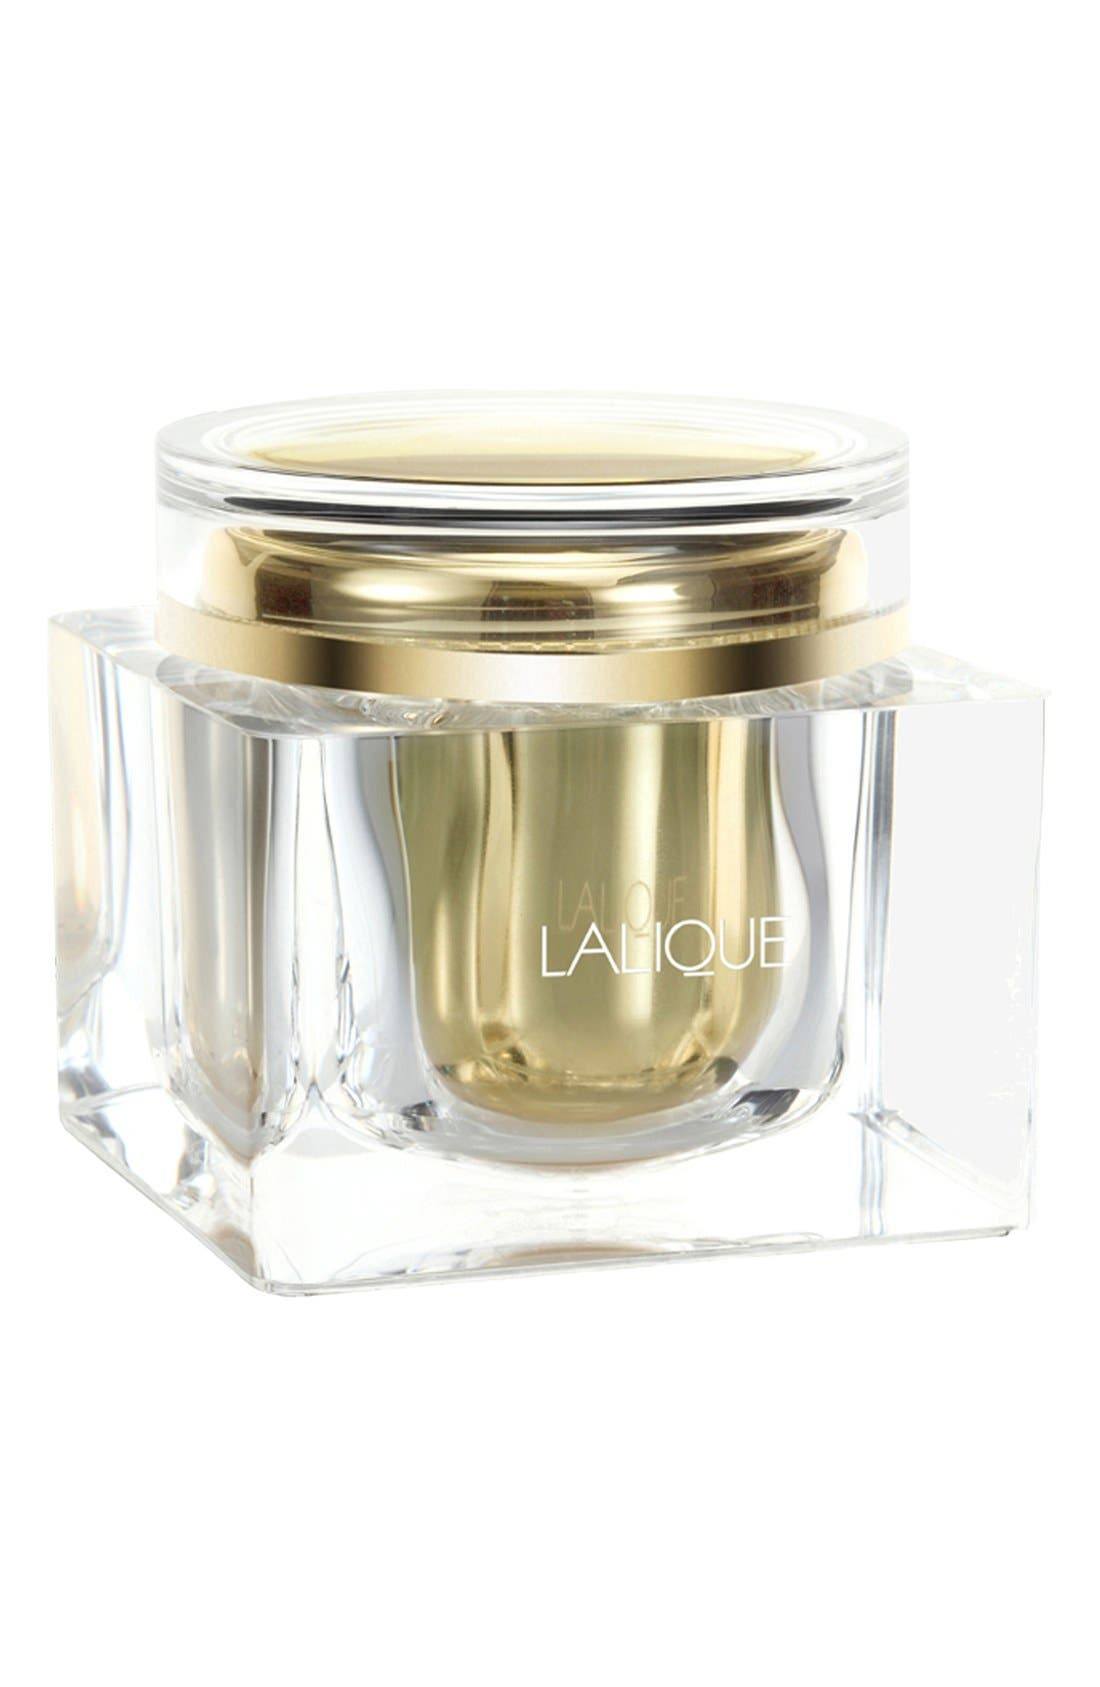 'Lalique de Lalique' Body Crème,                         Main,                         color, NO COLOR